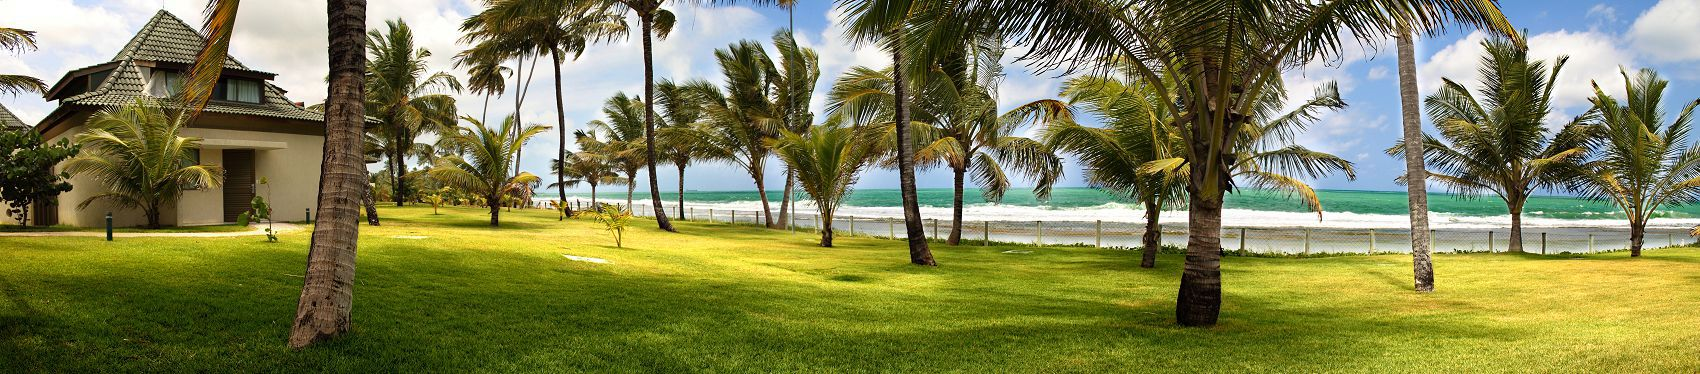 Маврикий пляж панорама